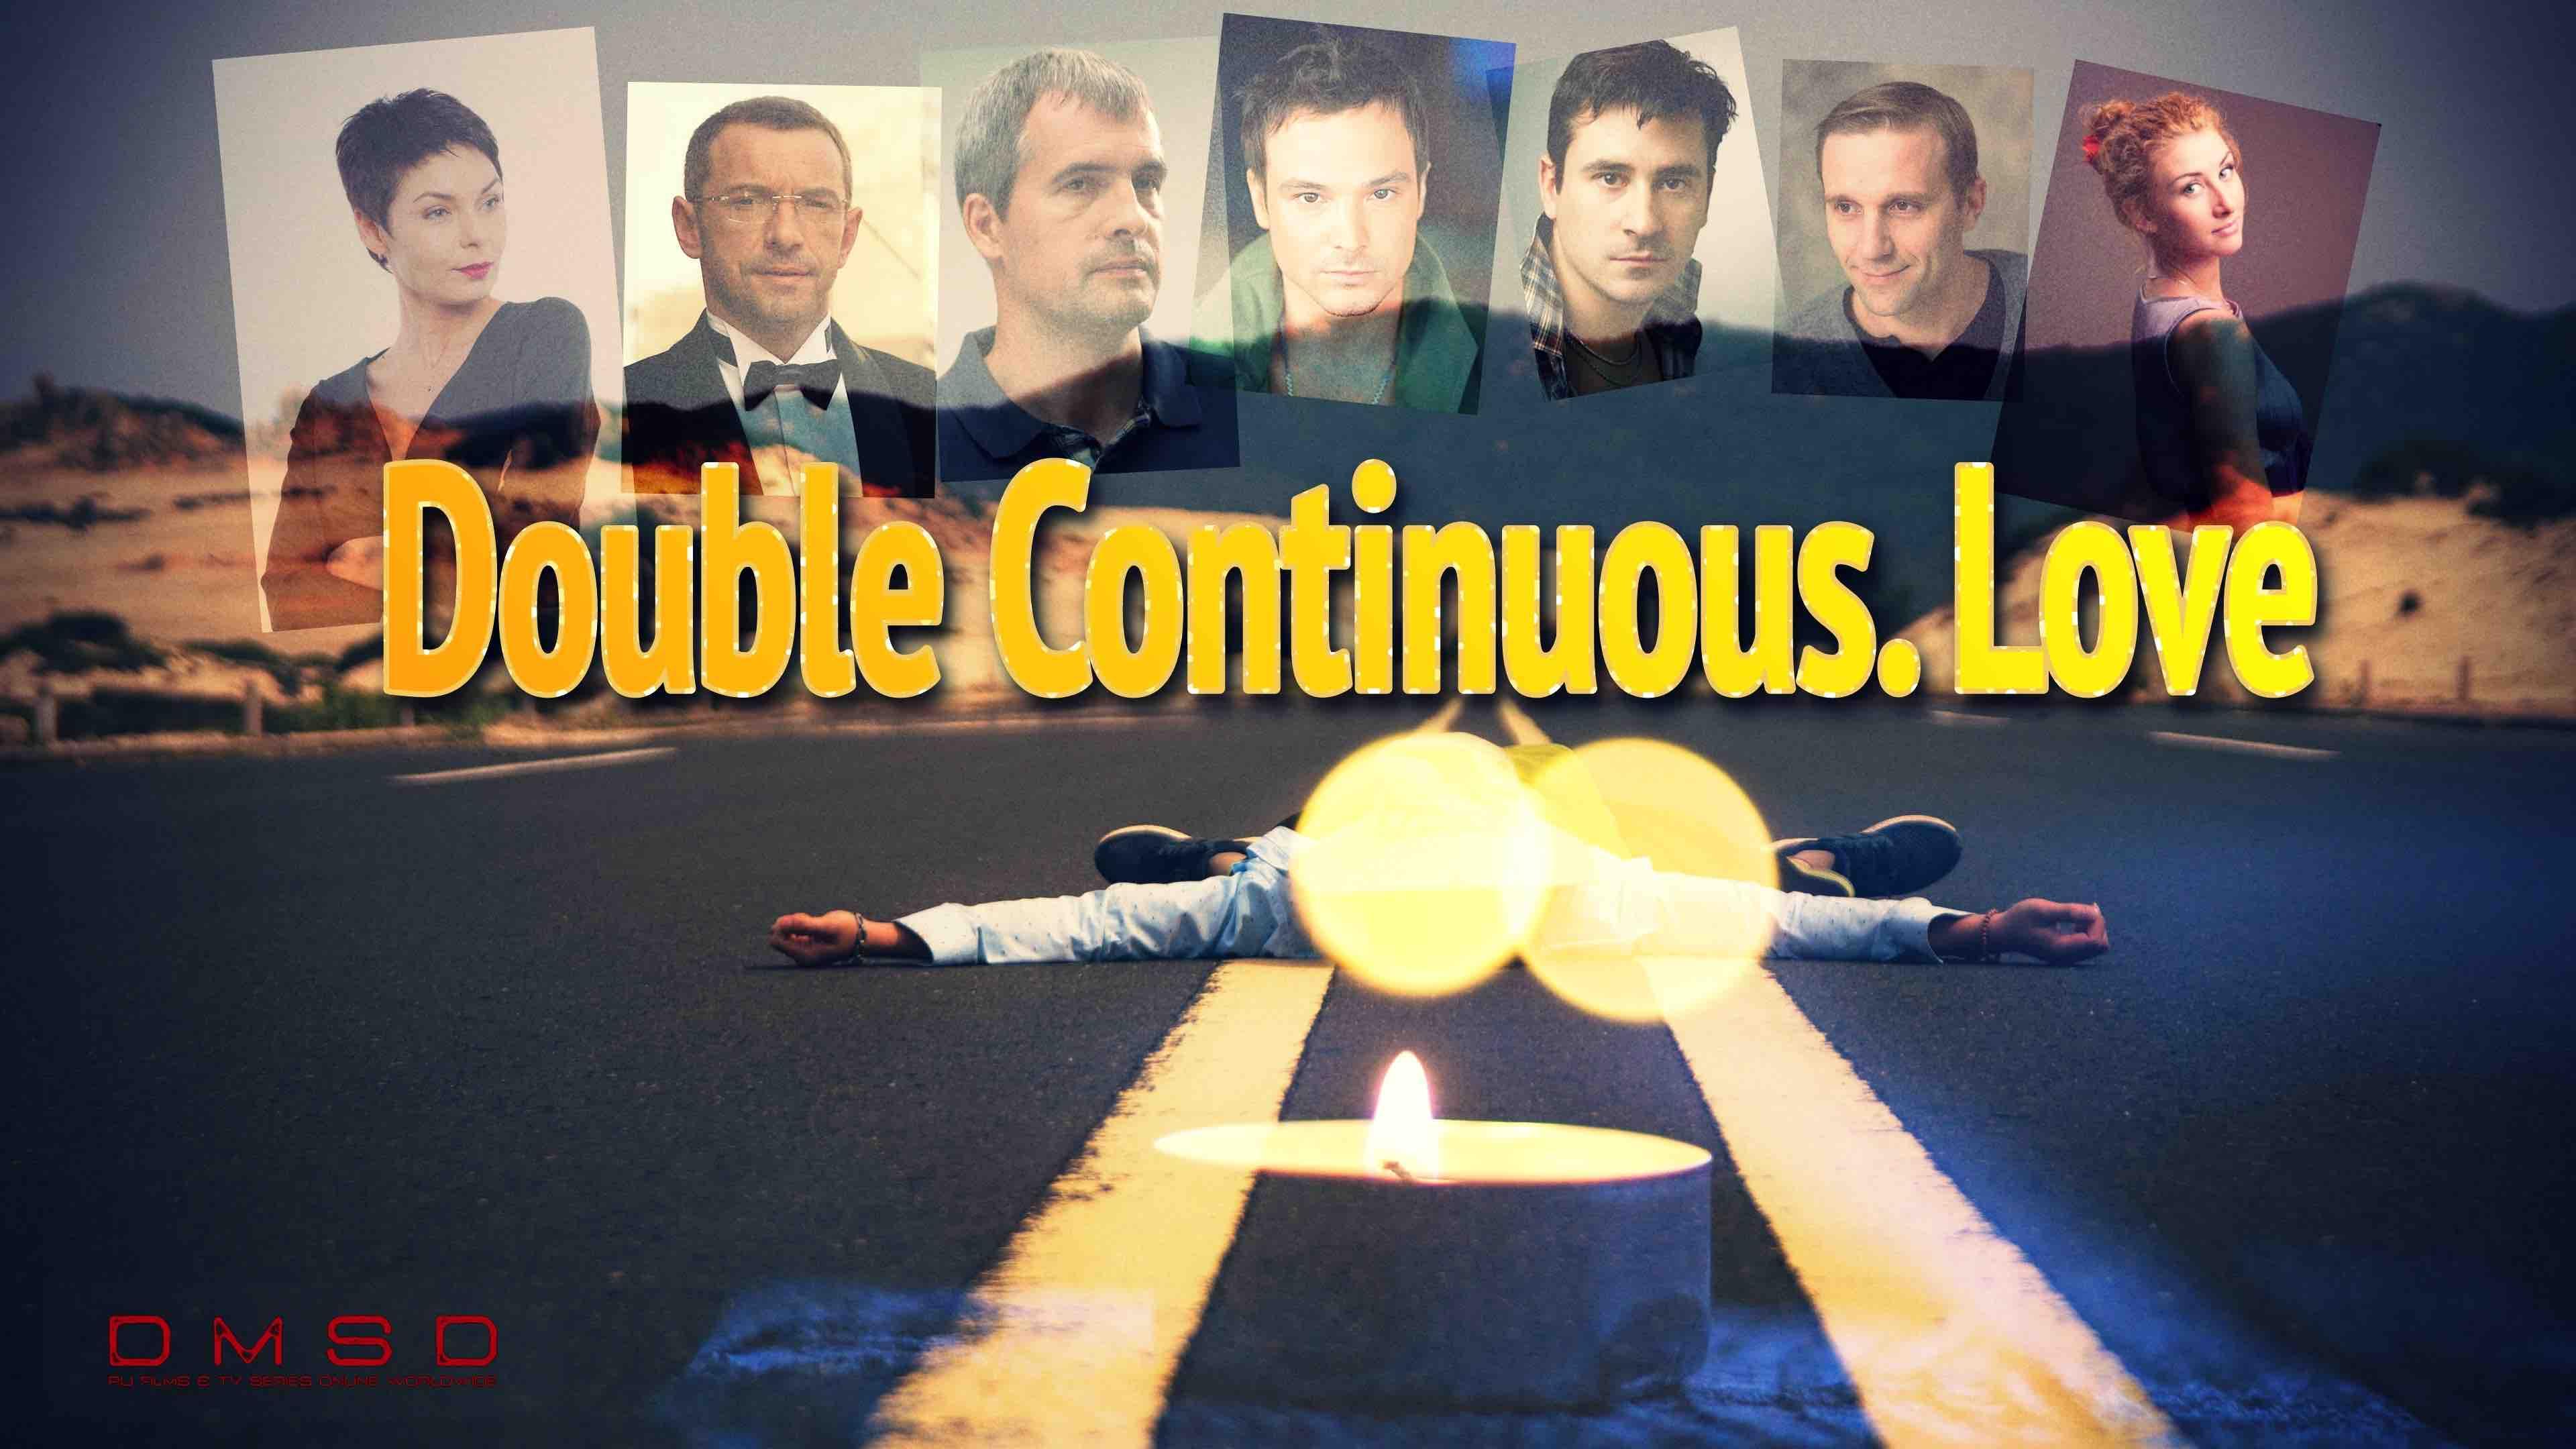 Double Continuous. Love [2011]